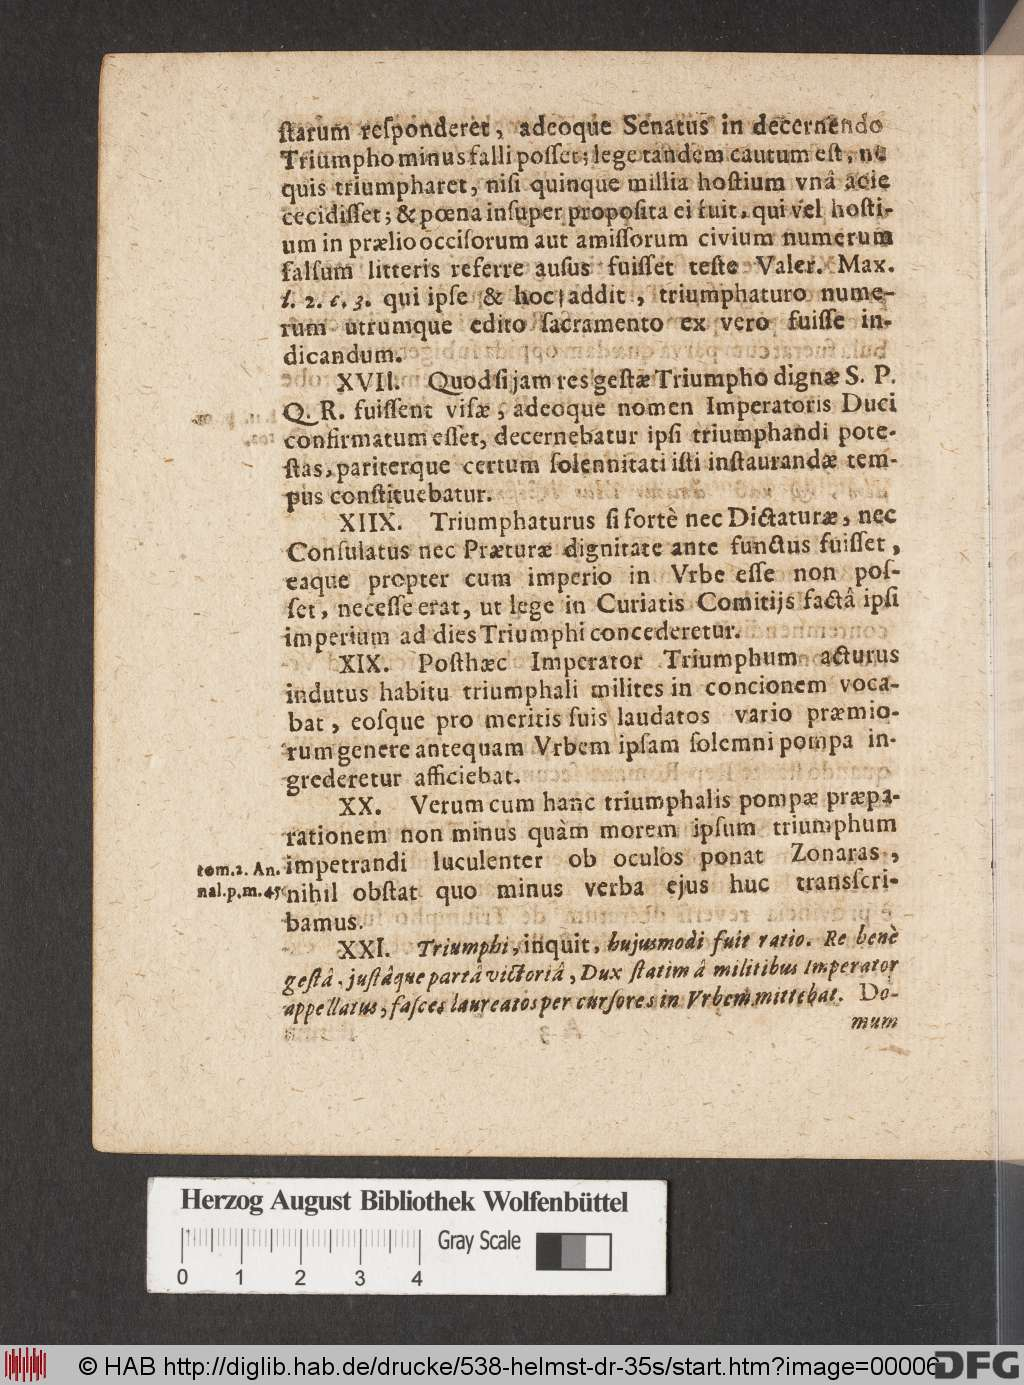 https://diglib.hab.de/drucke/538-helmst-dr-35s/00006.jpg